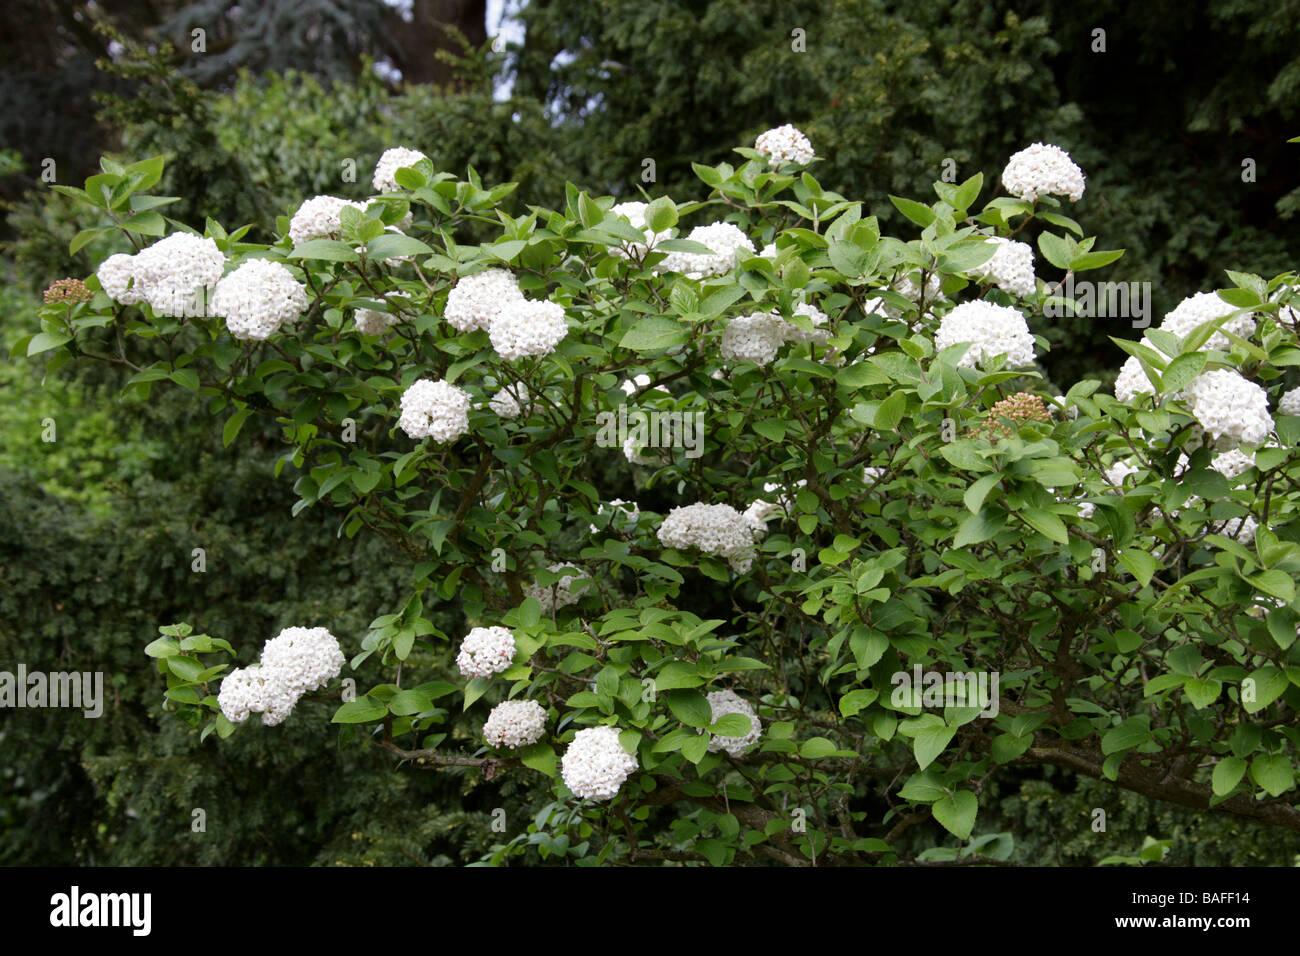 Cayuga Viburnum aka Fragrant Snowball, Viburnum carlcephalum, Adoxaceae - Stock Image